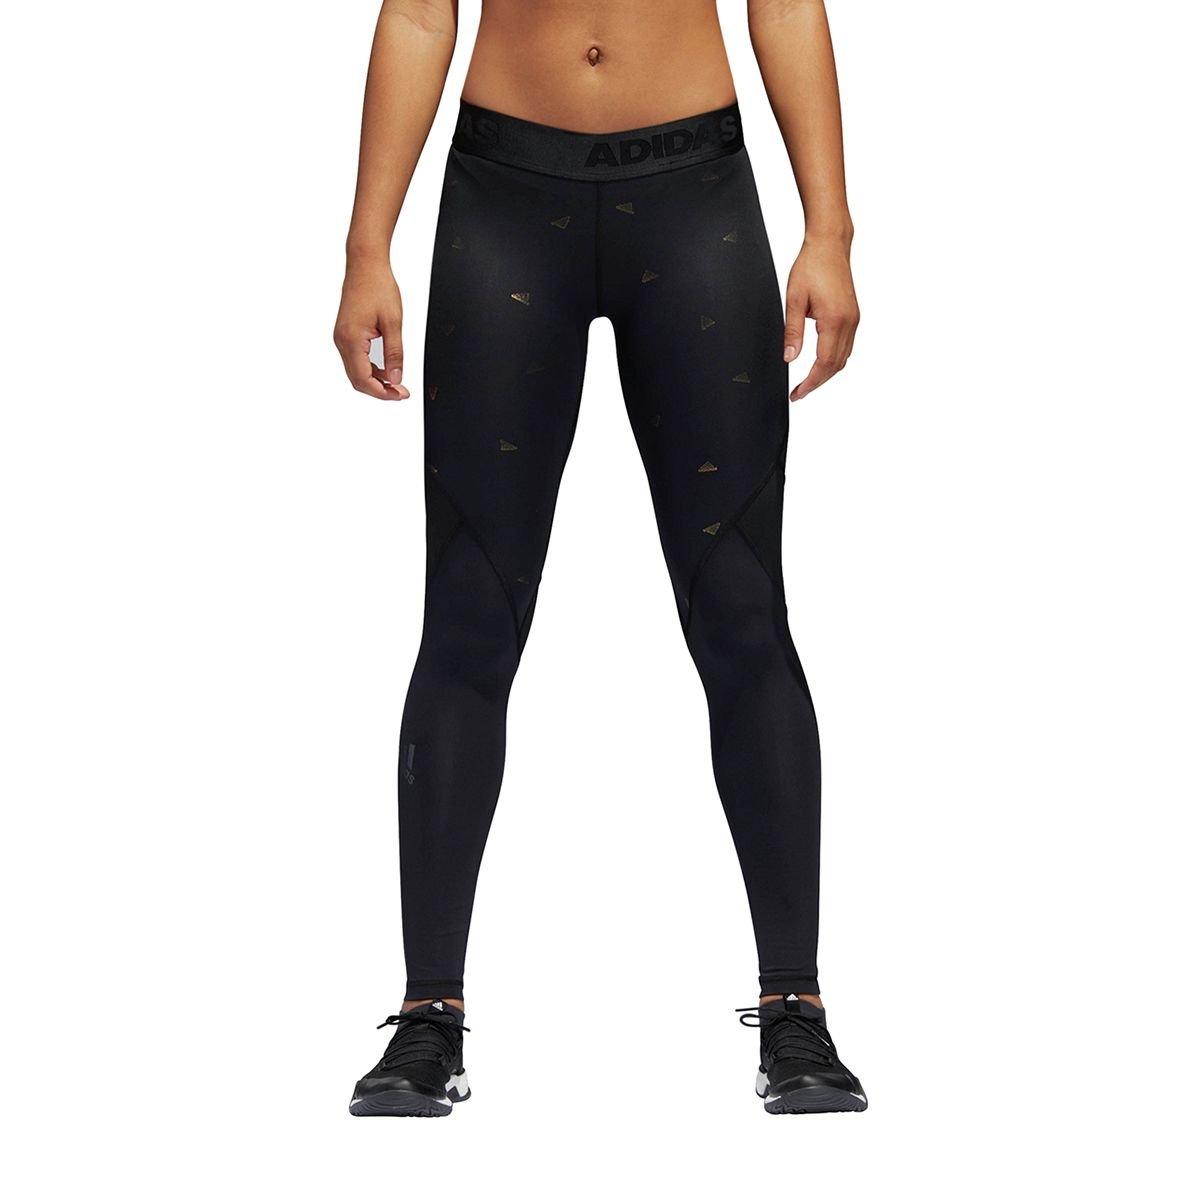 adidas Womens Fitness Yoga Athletic Leggings at Amazon ...